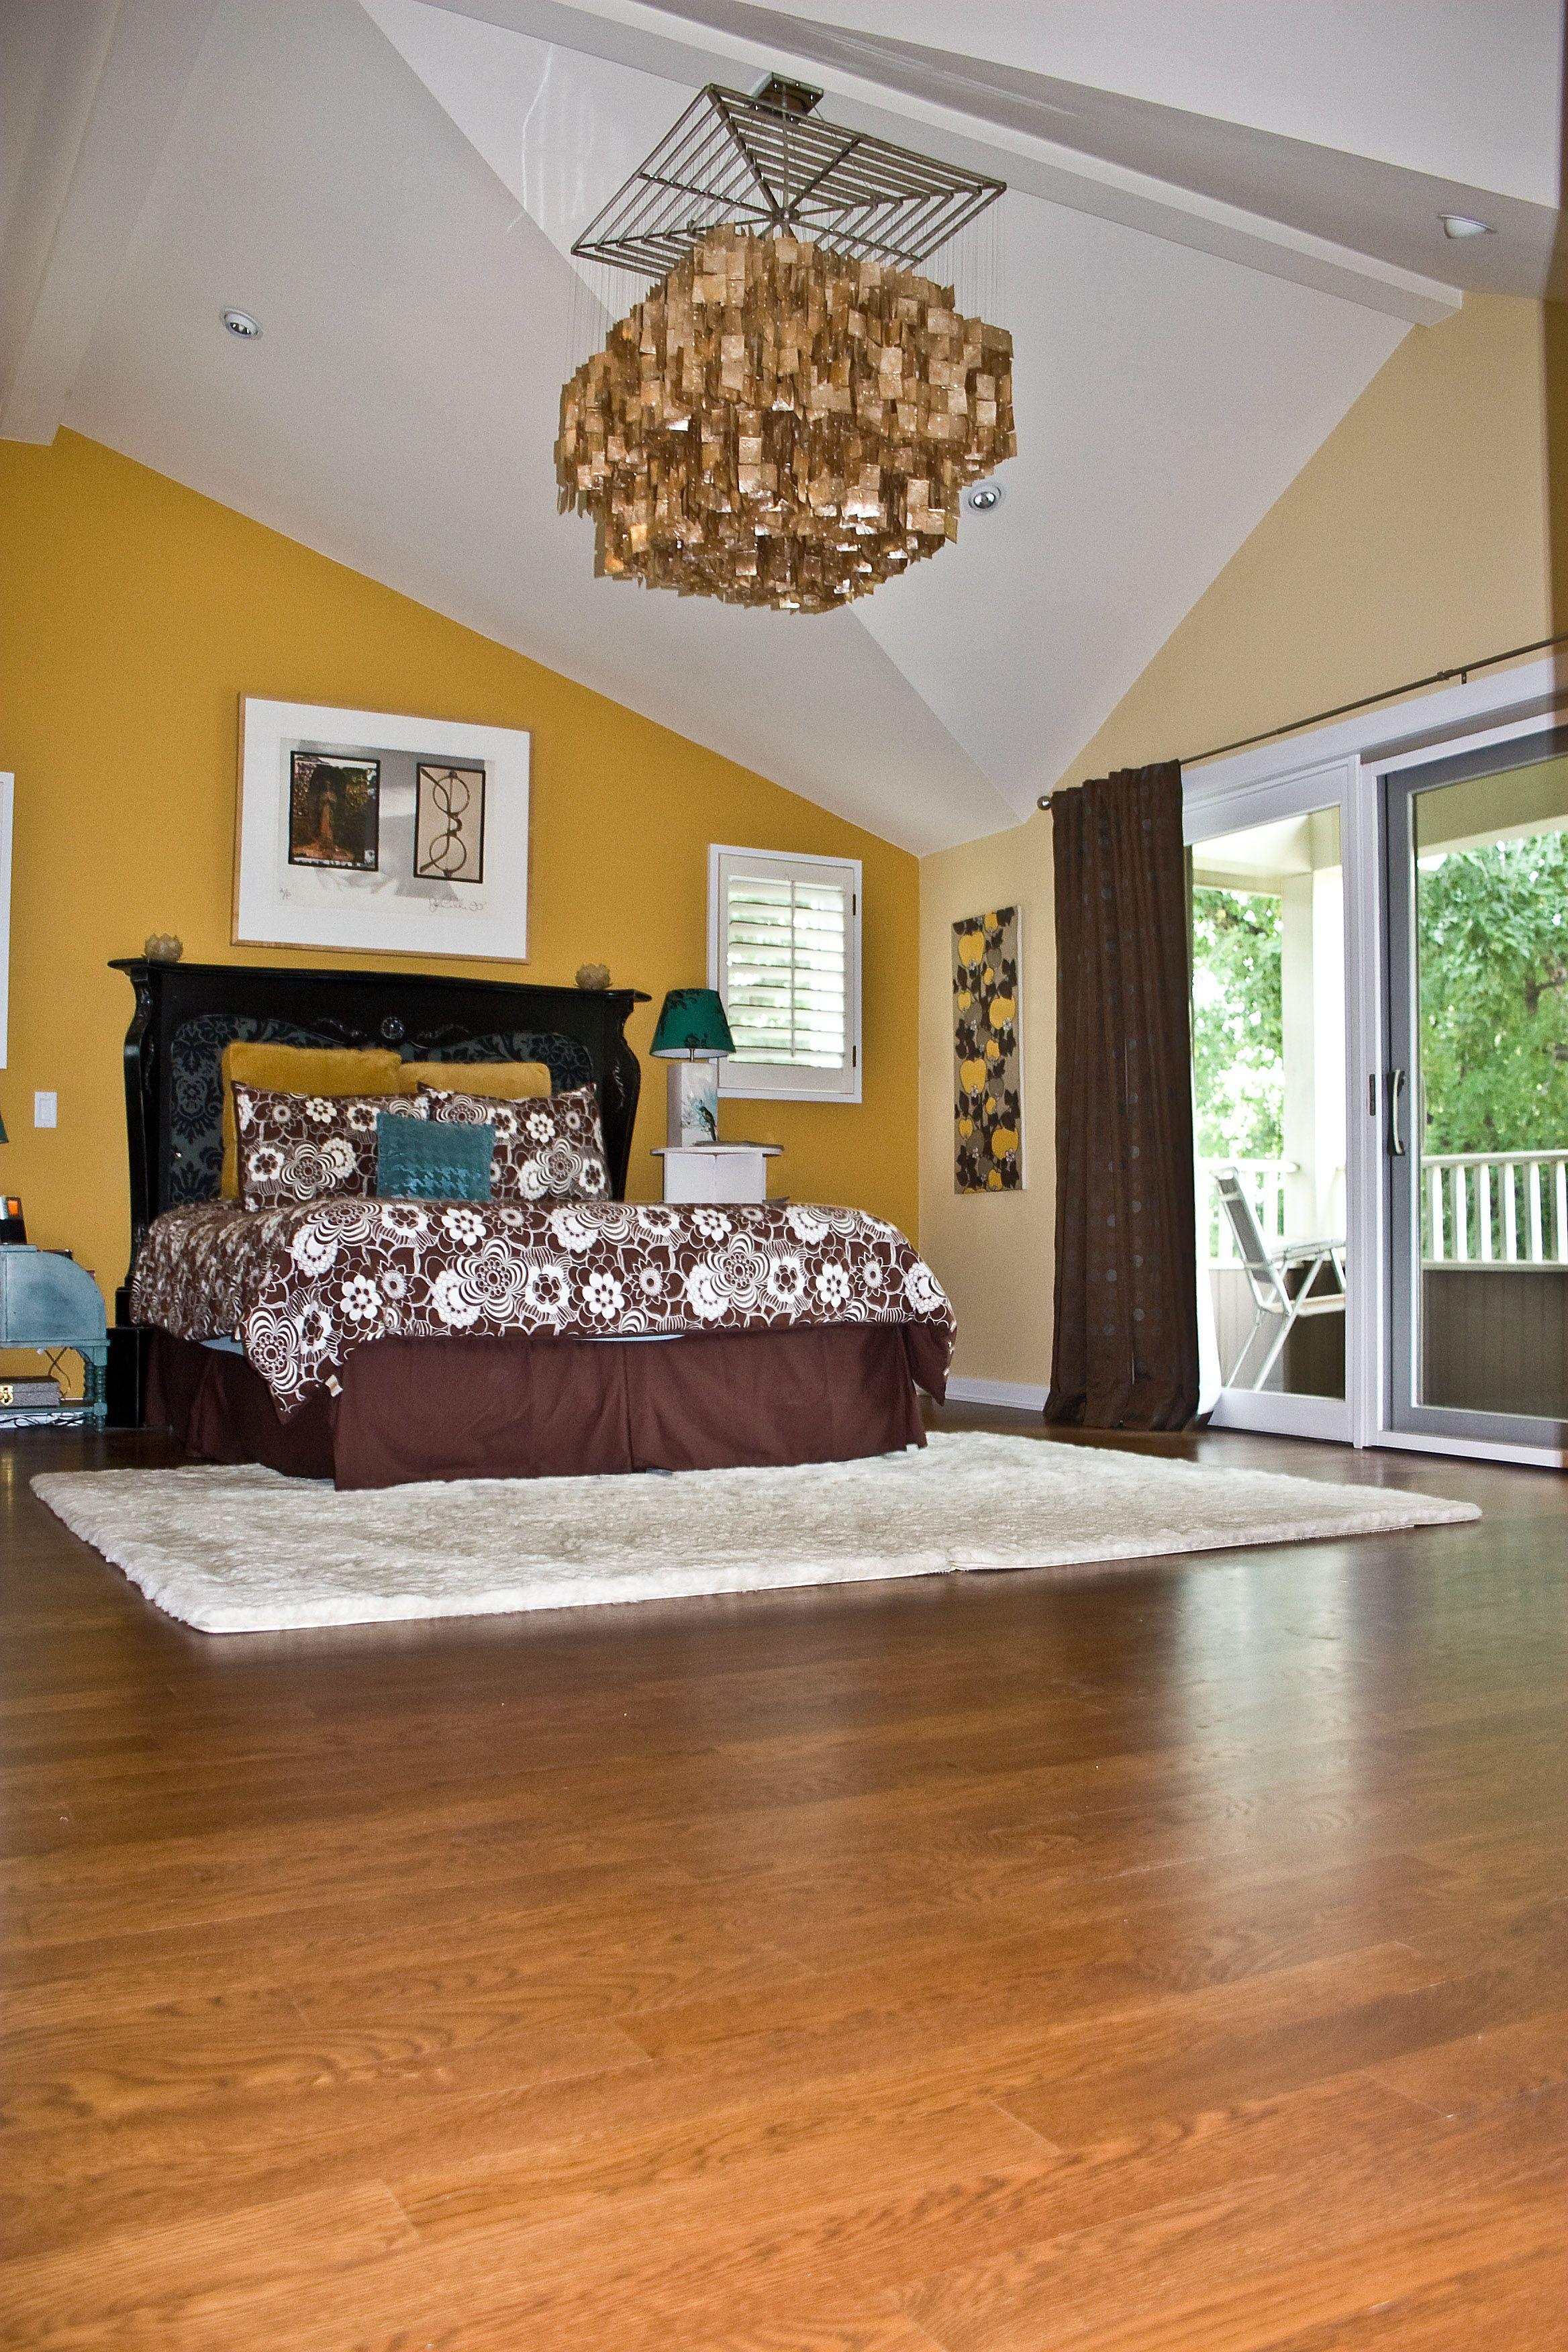 Red Oak Flooring Adds To This Fun Bedroom Decor Red Oak Floors Awesome Bedrooms Oak Floors